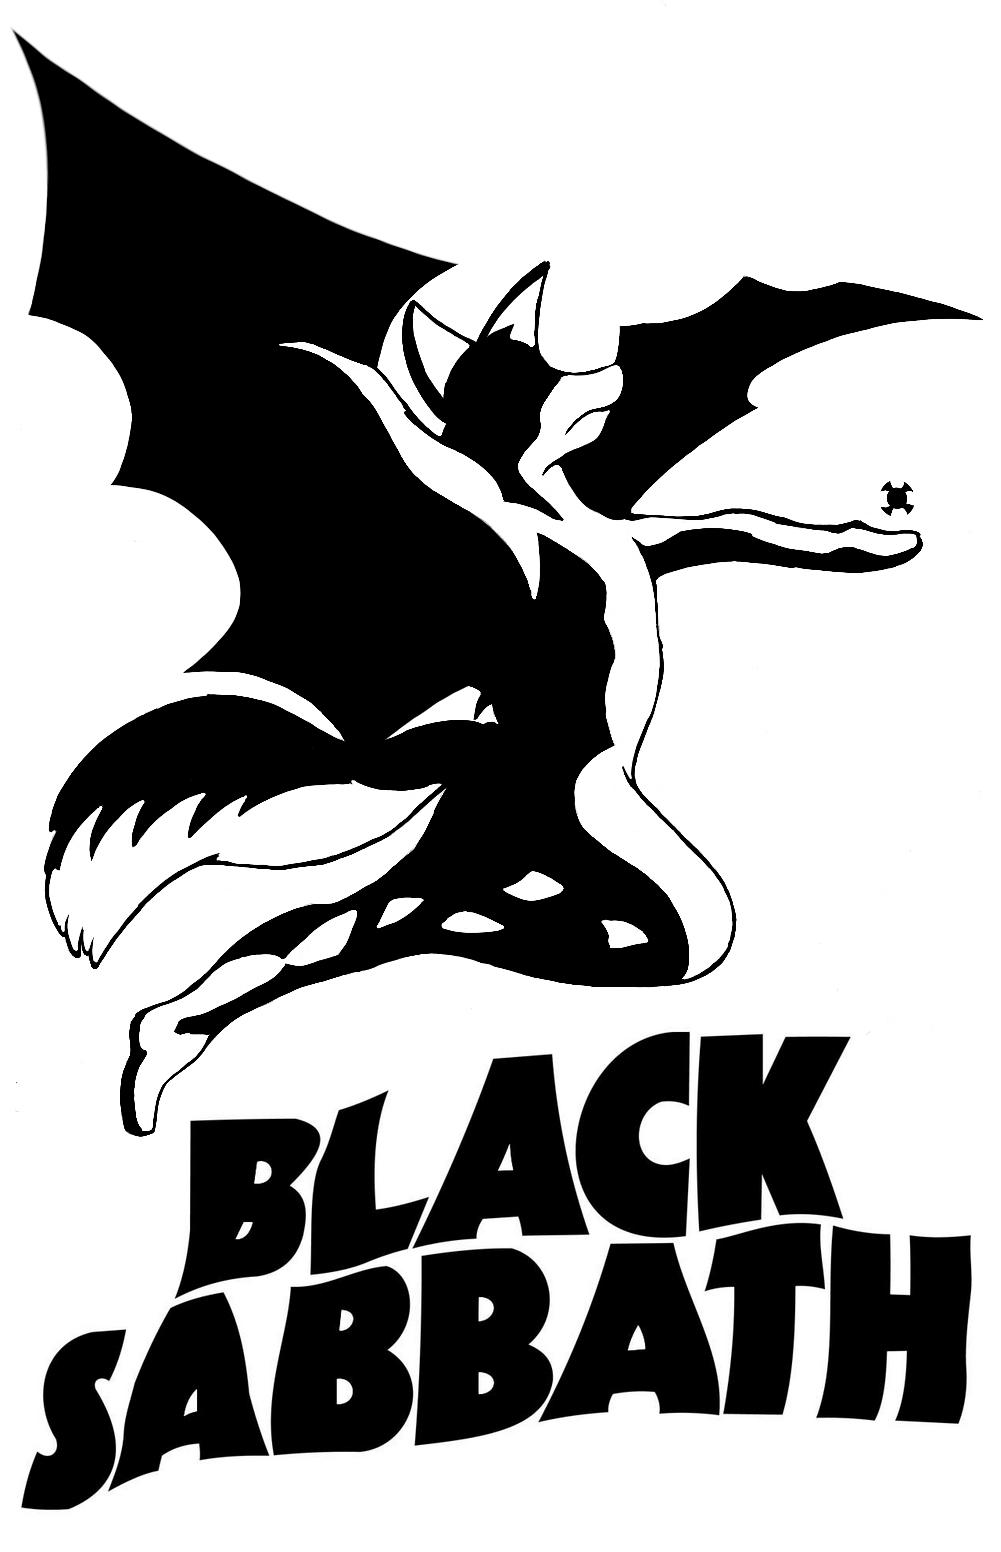 . Hdpng.com Black Sabbath Logo (Furry Version With Fox) By Goldyfox - Black Sabbath, Transparent background PNG HD thumbnail